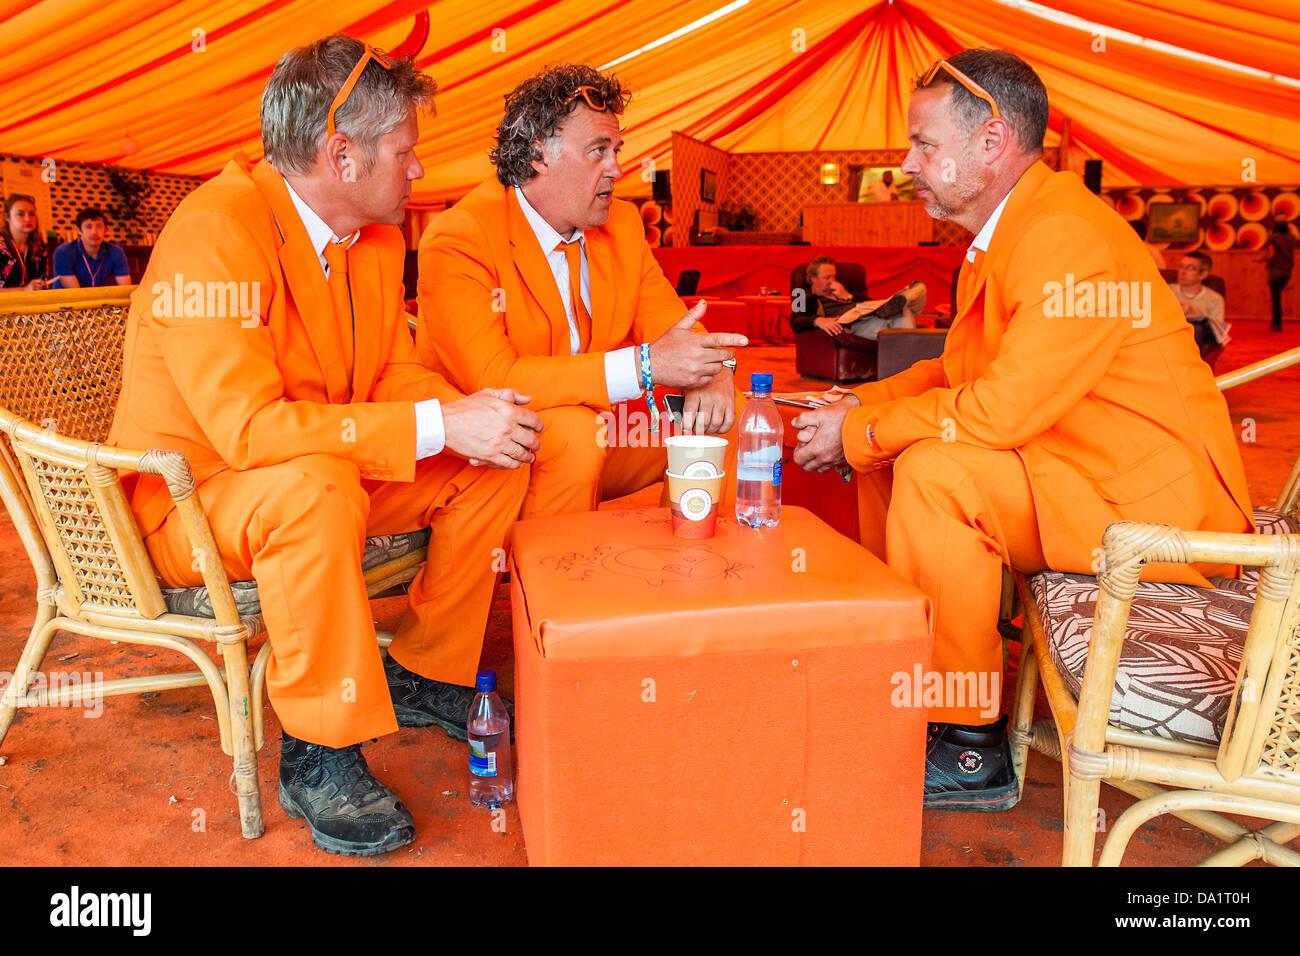 three dutchmen chilling in